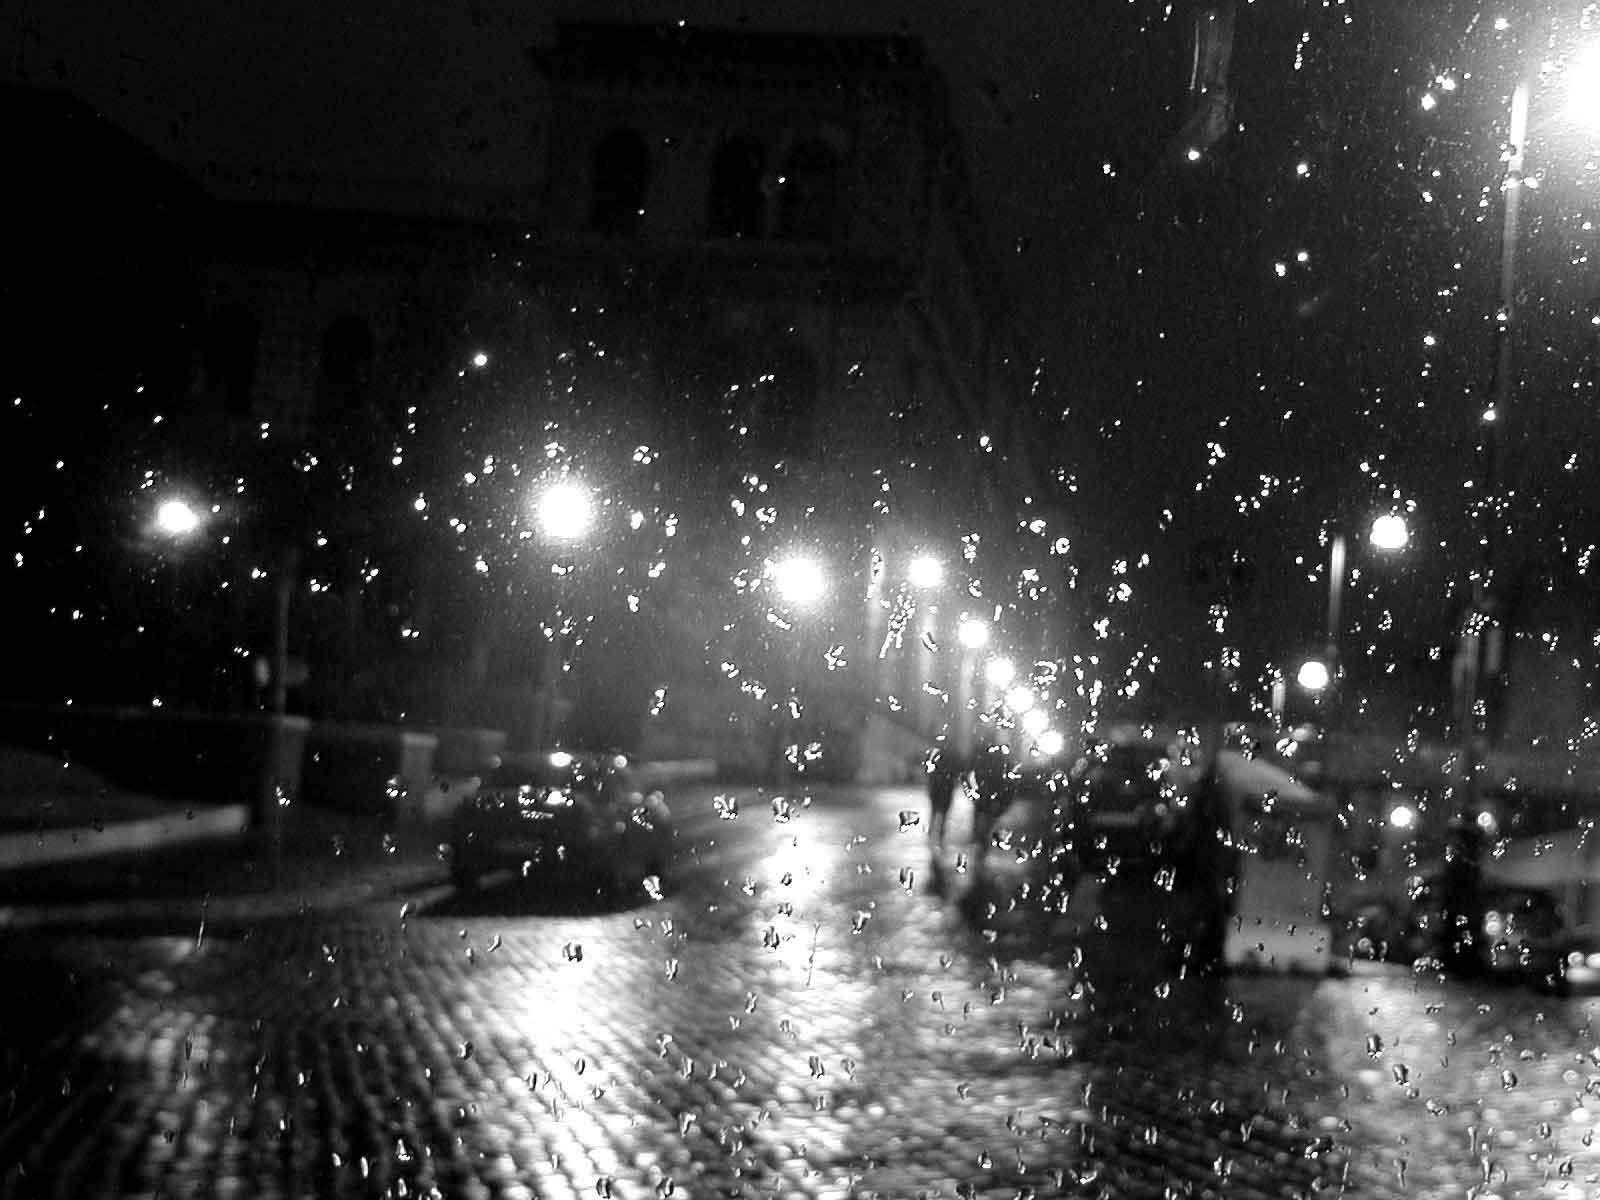 http://4.bp.blogspot.com/_kFgIjPvu35M/TNaD6OxEBII/AAAAAAAAAAg/gO5gJv5wsYw/s1600/pioggia-notte.jpg